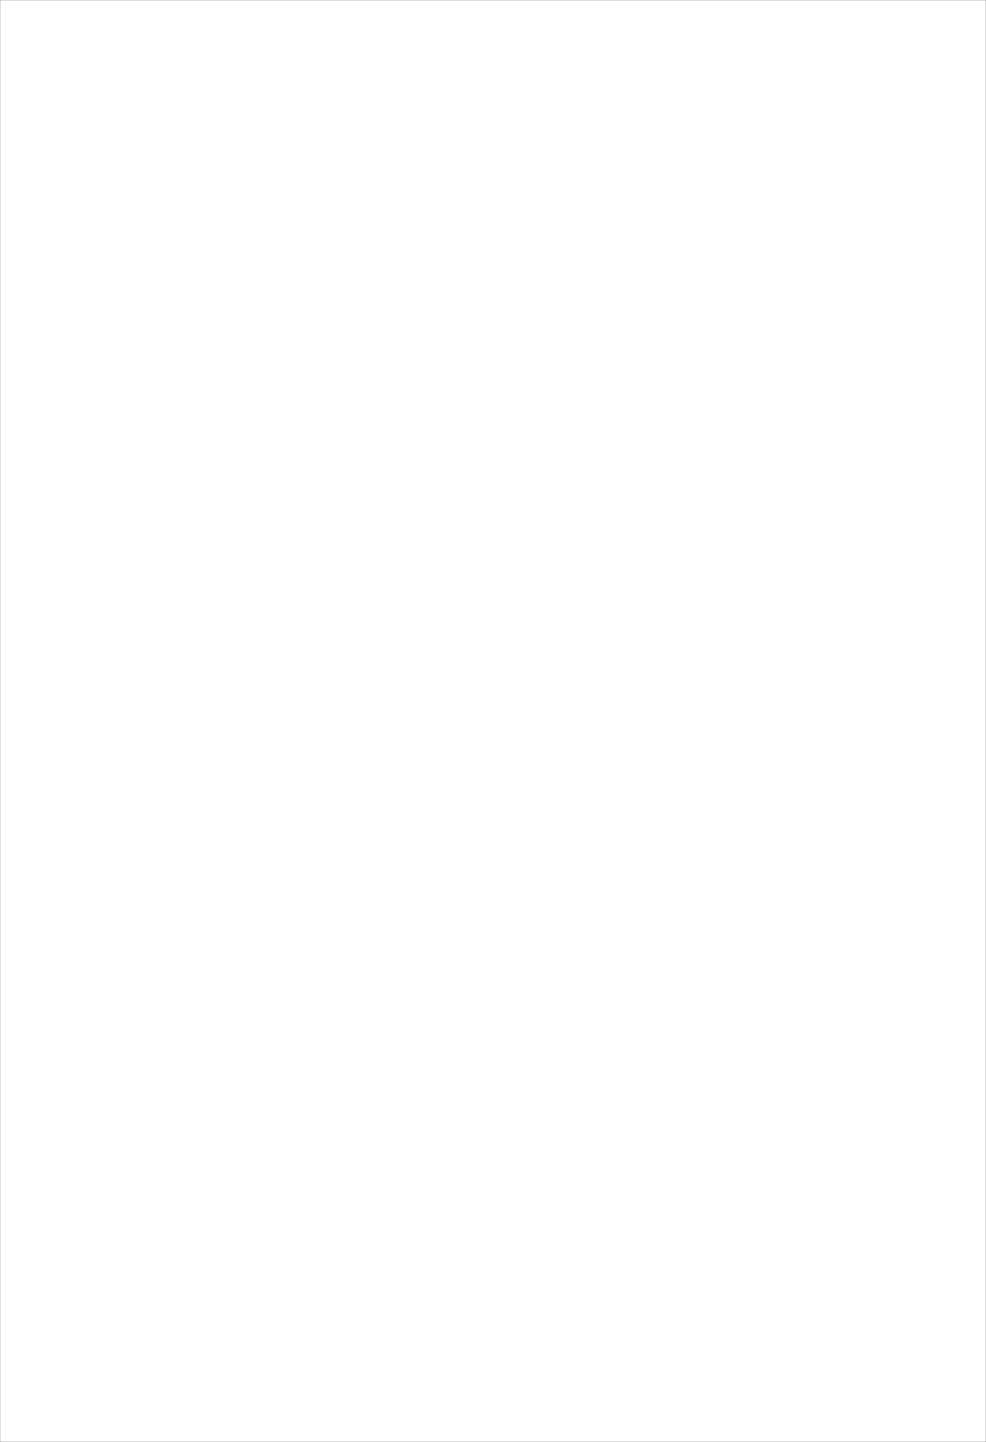 Anata no Soba ni Itai kara Vol. 3 1